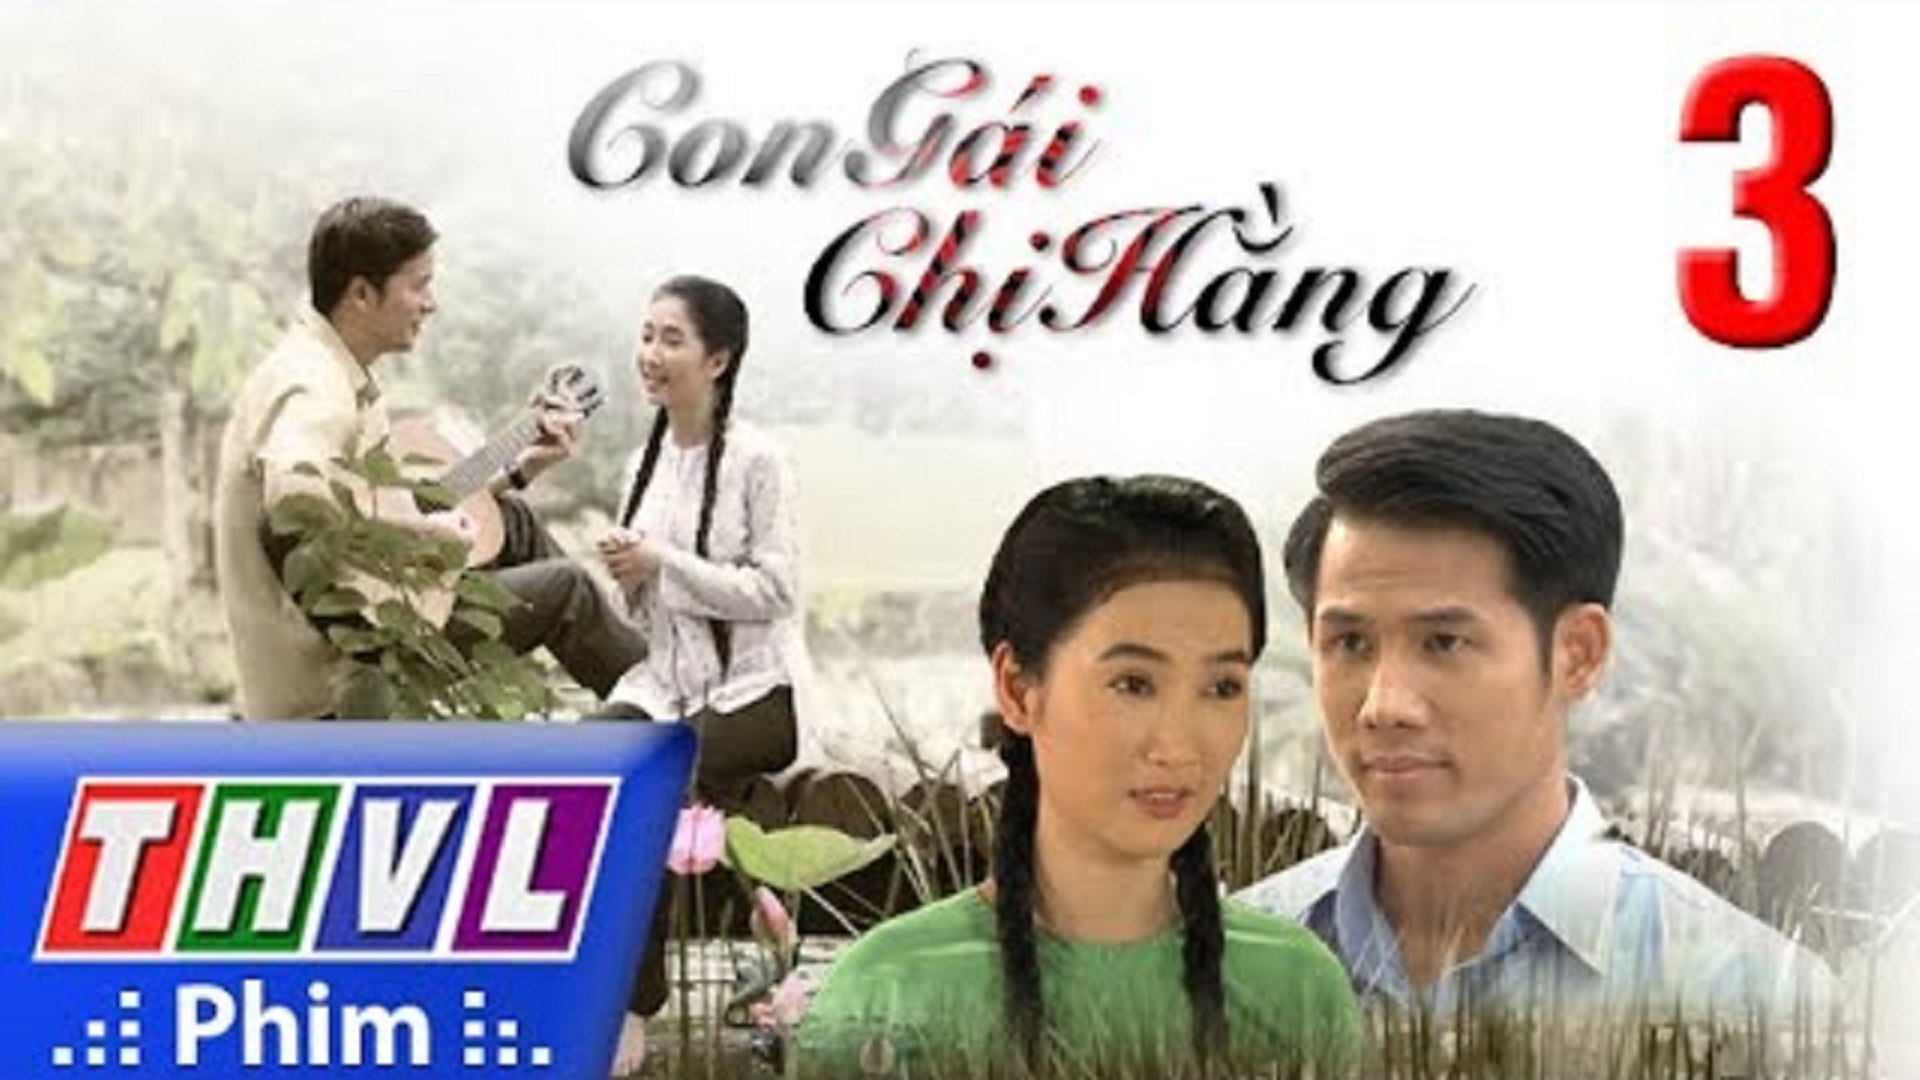 Con Gái Chị Hằng Tập 3 - Phim Con Gái Chị Hằng - THVL1 - Phim Việt Nam - Phim 2017 - Con Gai Chi Han